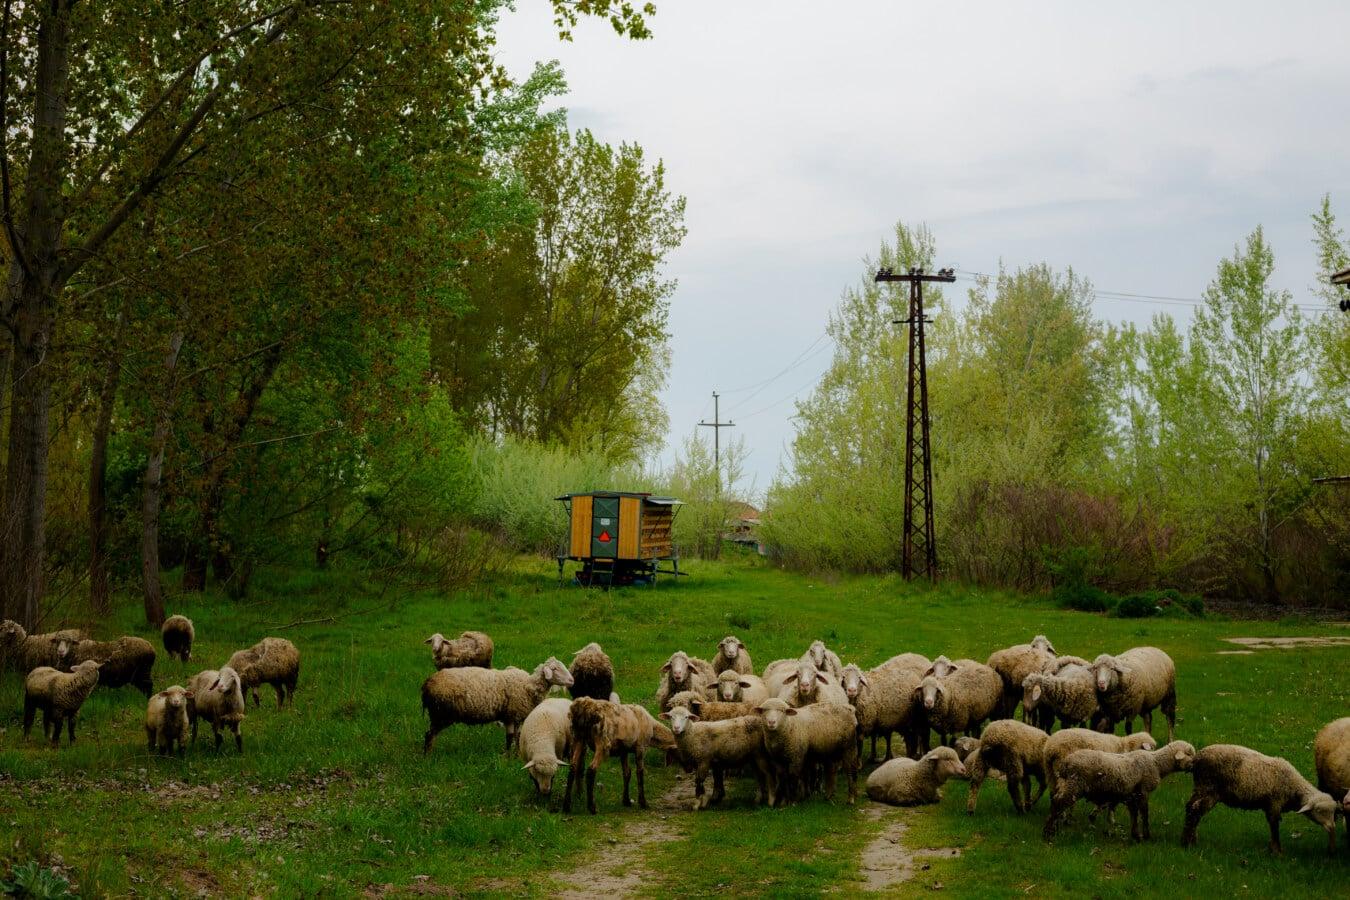 animals, sheep, livestock, lamb, cattle, farm, landscape, grass, agriculture, tree